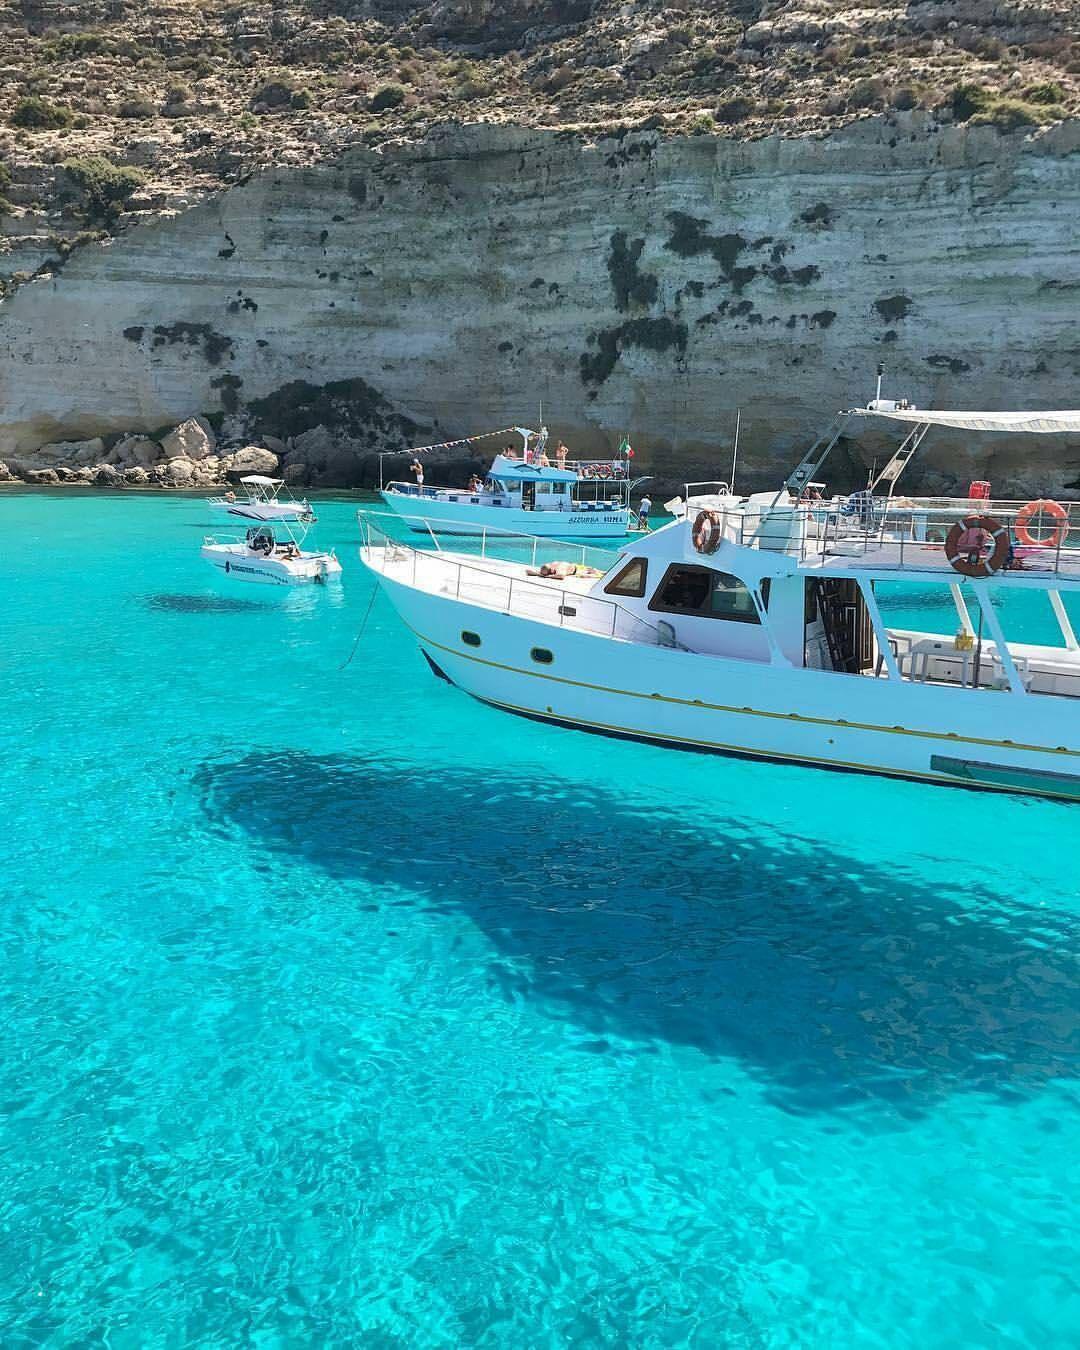 Flying Boats At La Tabaccara Lampedusa Island Sicily Repost From